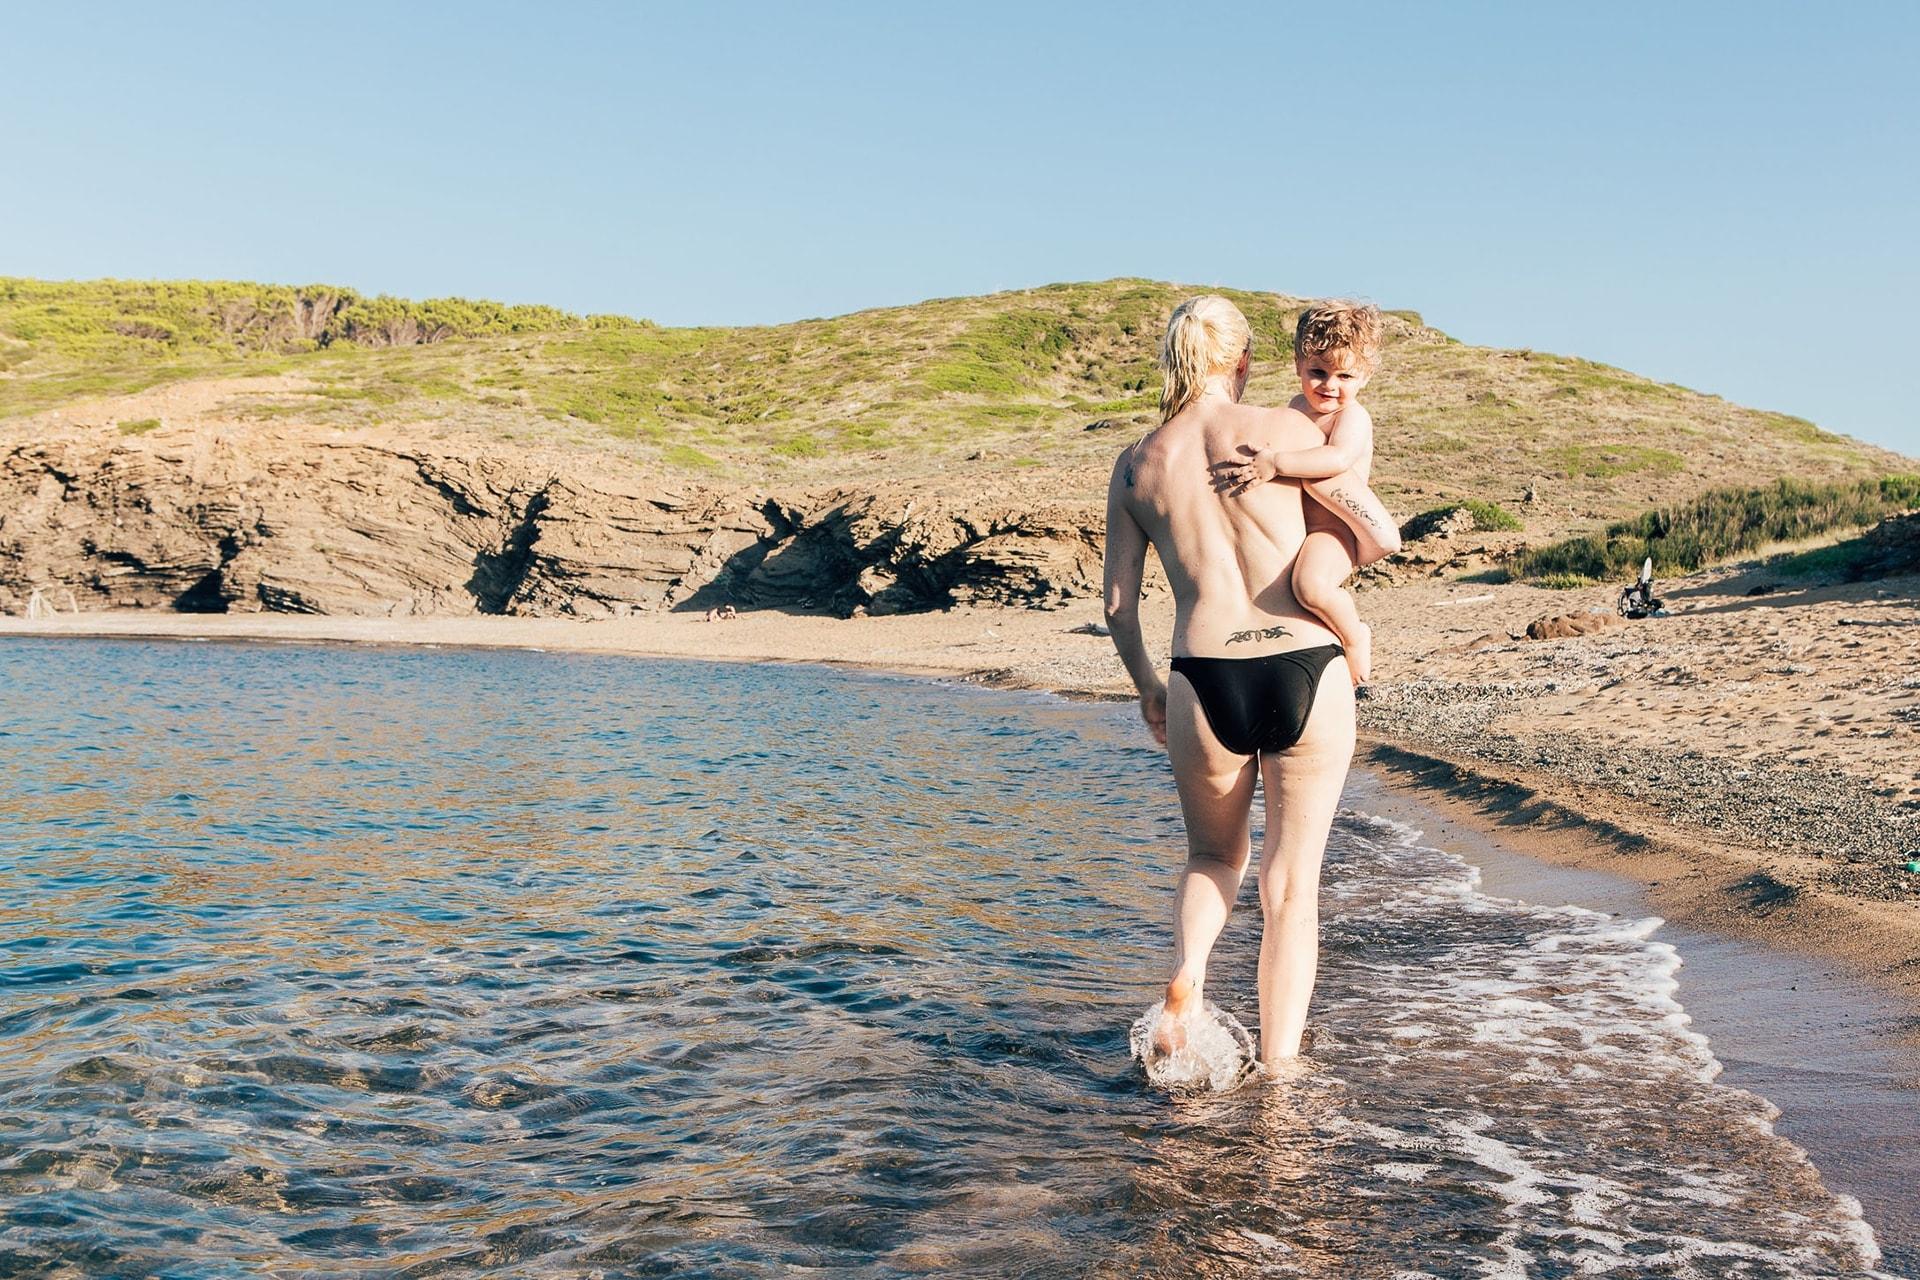 Sabine porte Soren au bord de l'eau à Cala Mica